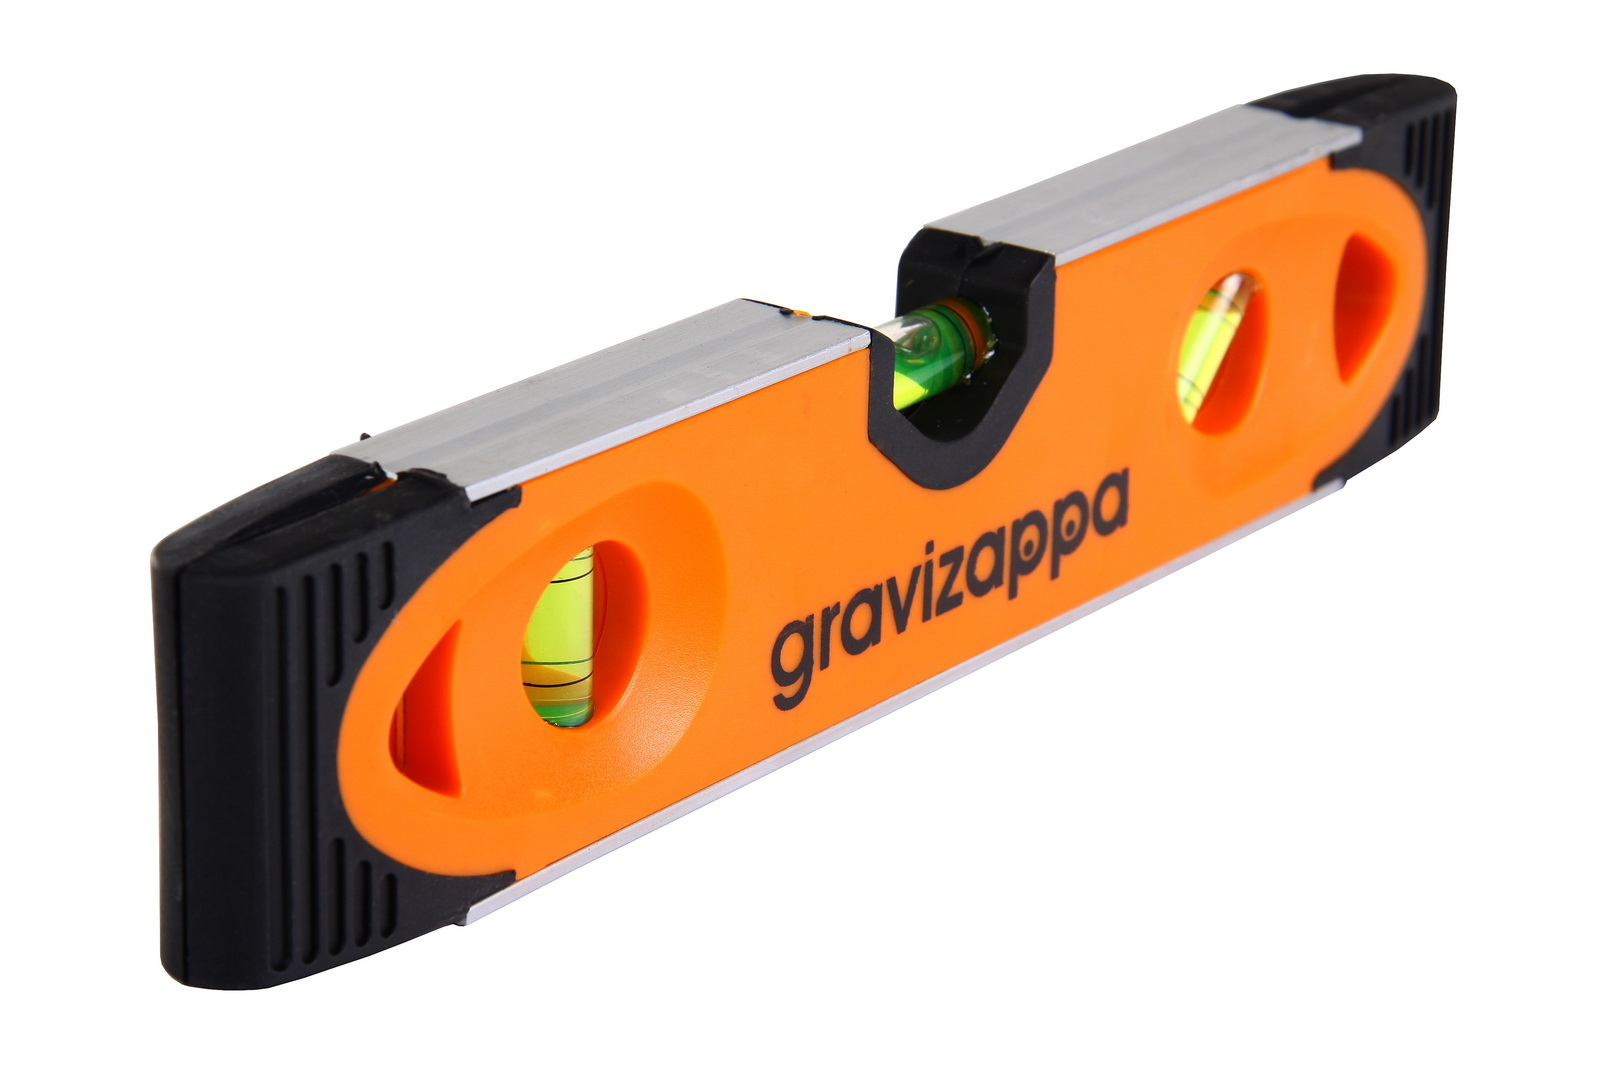 Уровень пузырьковый Gravizappa Ust230 mini 306-009 мамин сибиряк дмитрий наркисович самый храбрый заяц